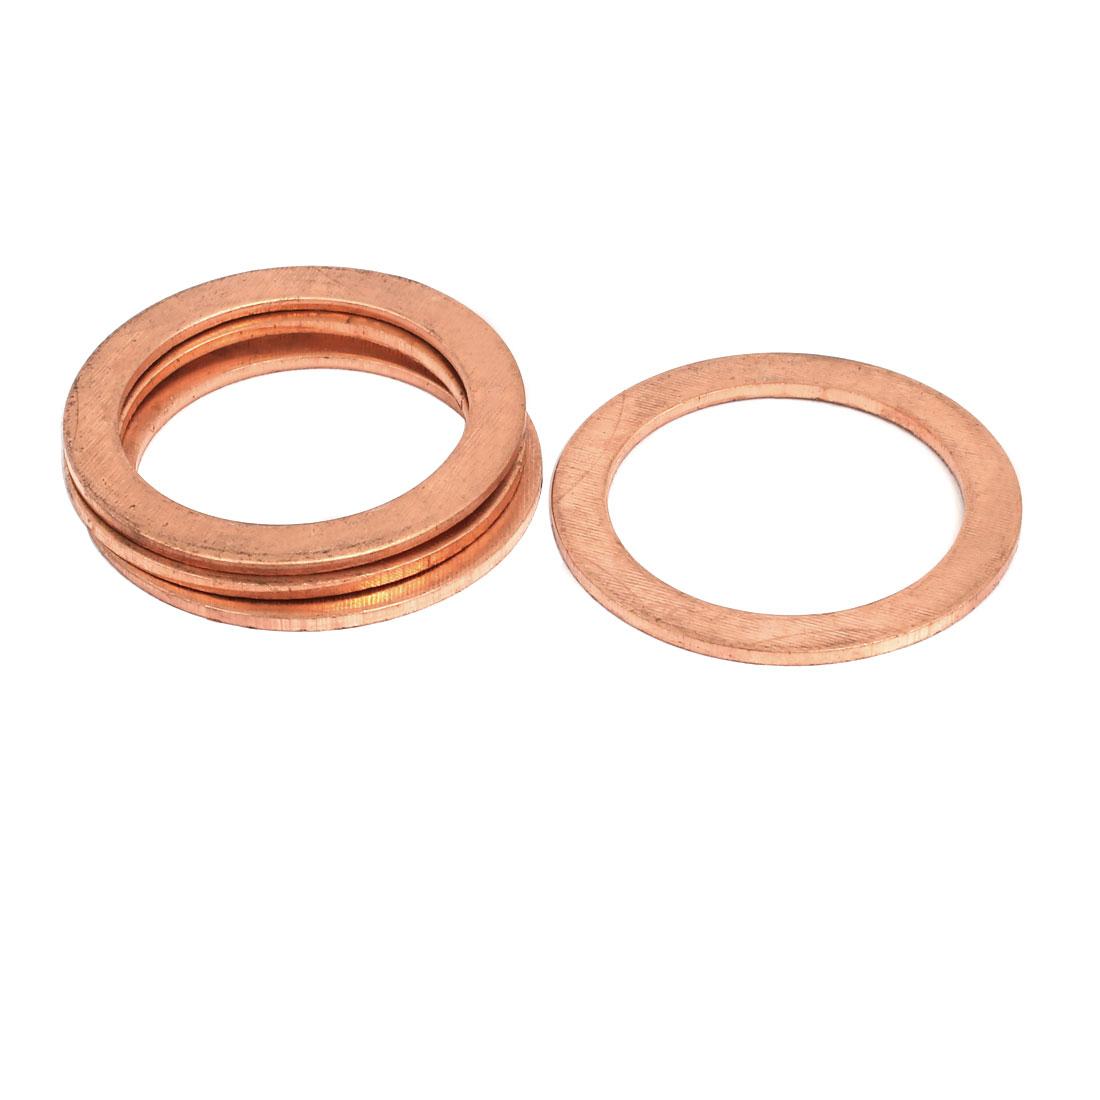 4pcs 30mmx40mmx1.5mm Copper Flat Ring Sealing Crush Washer Gasket